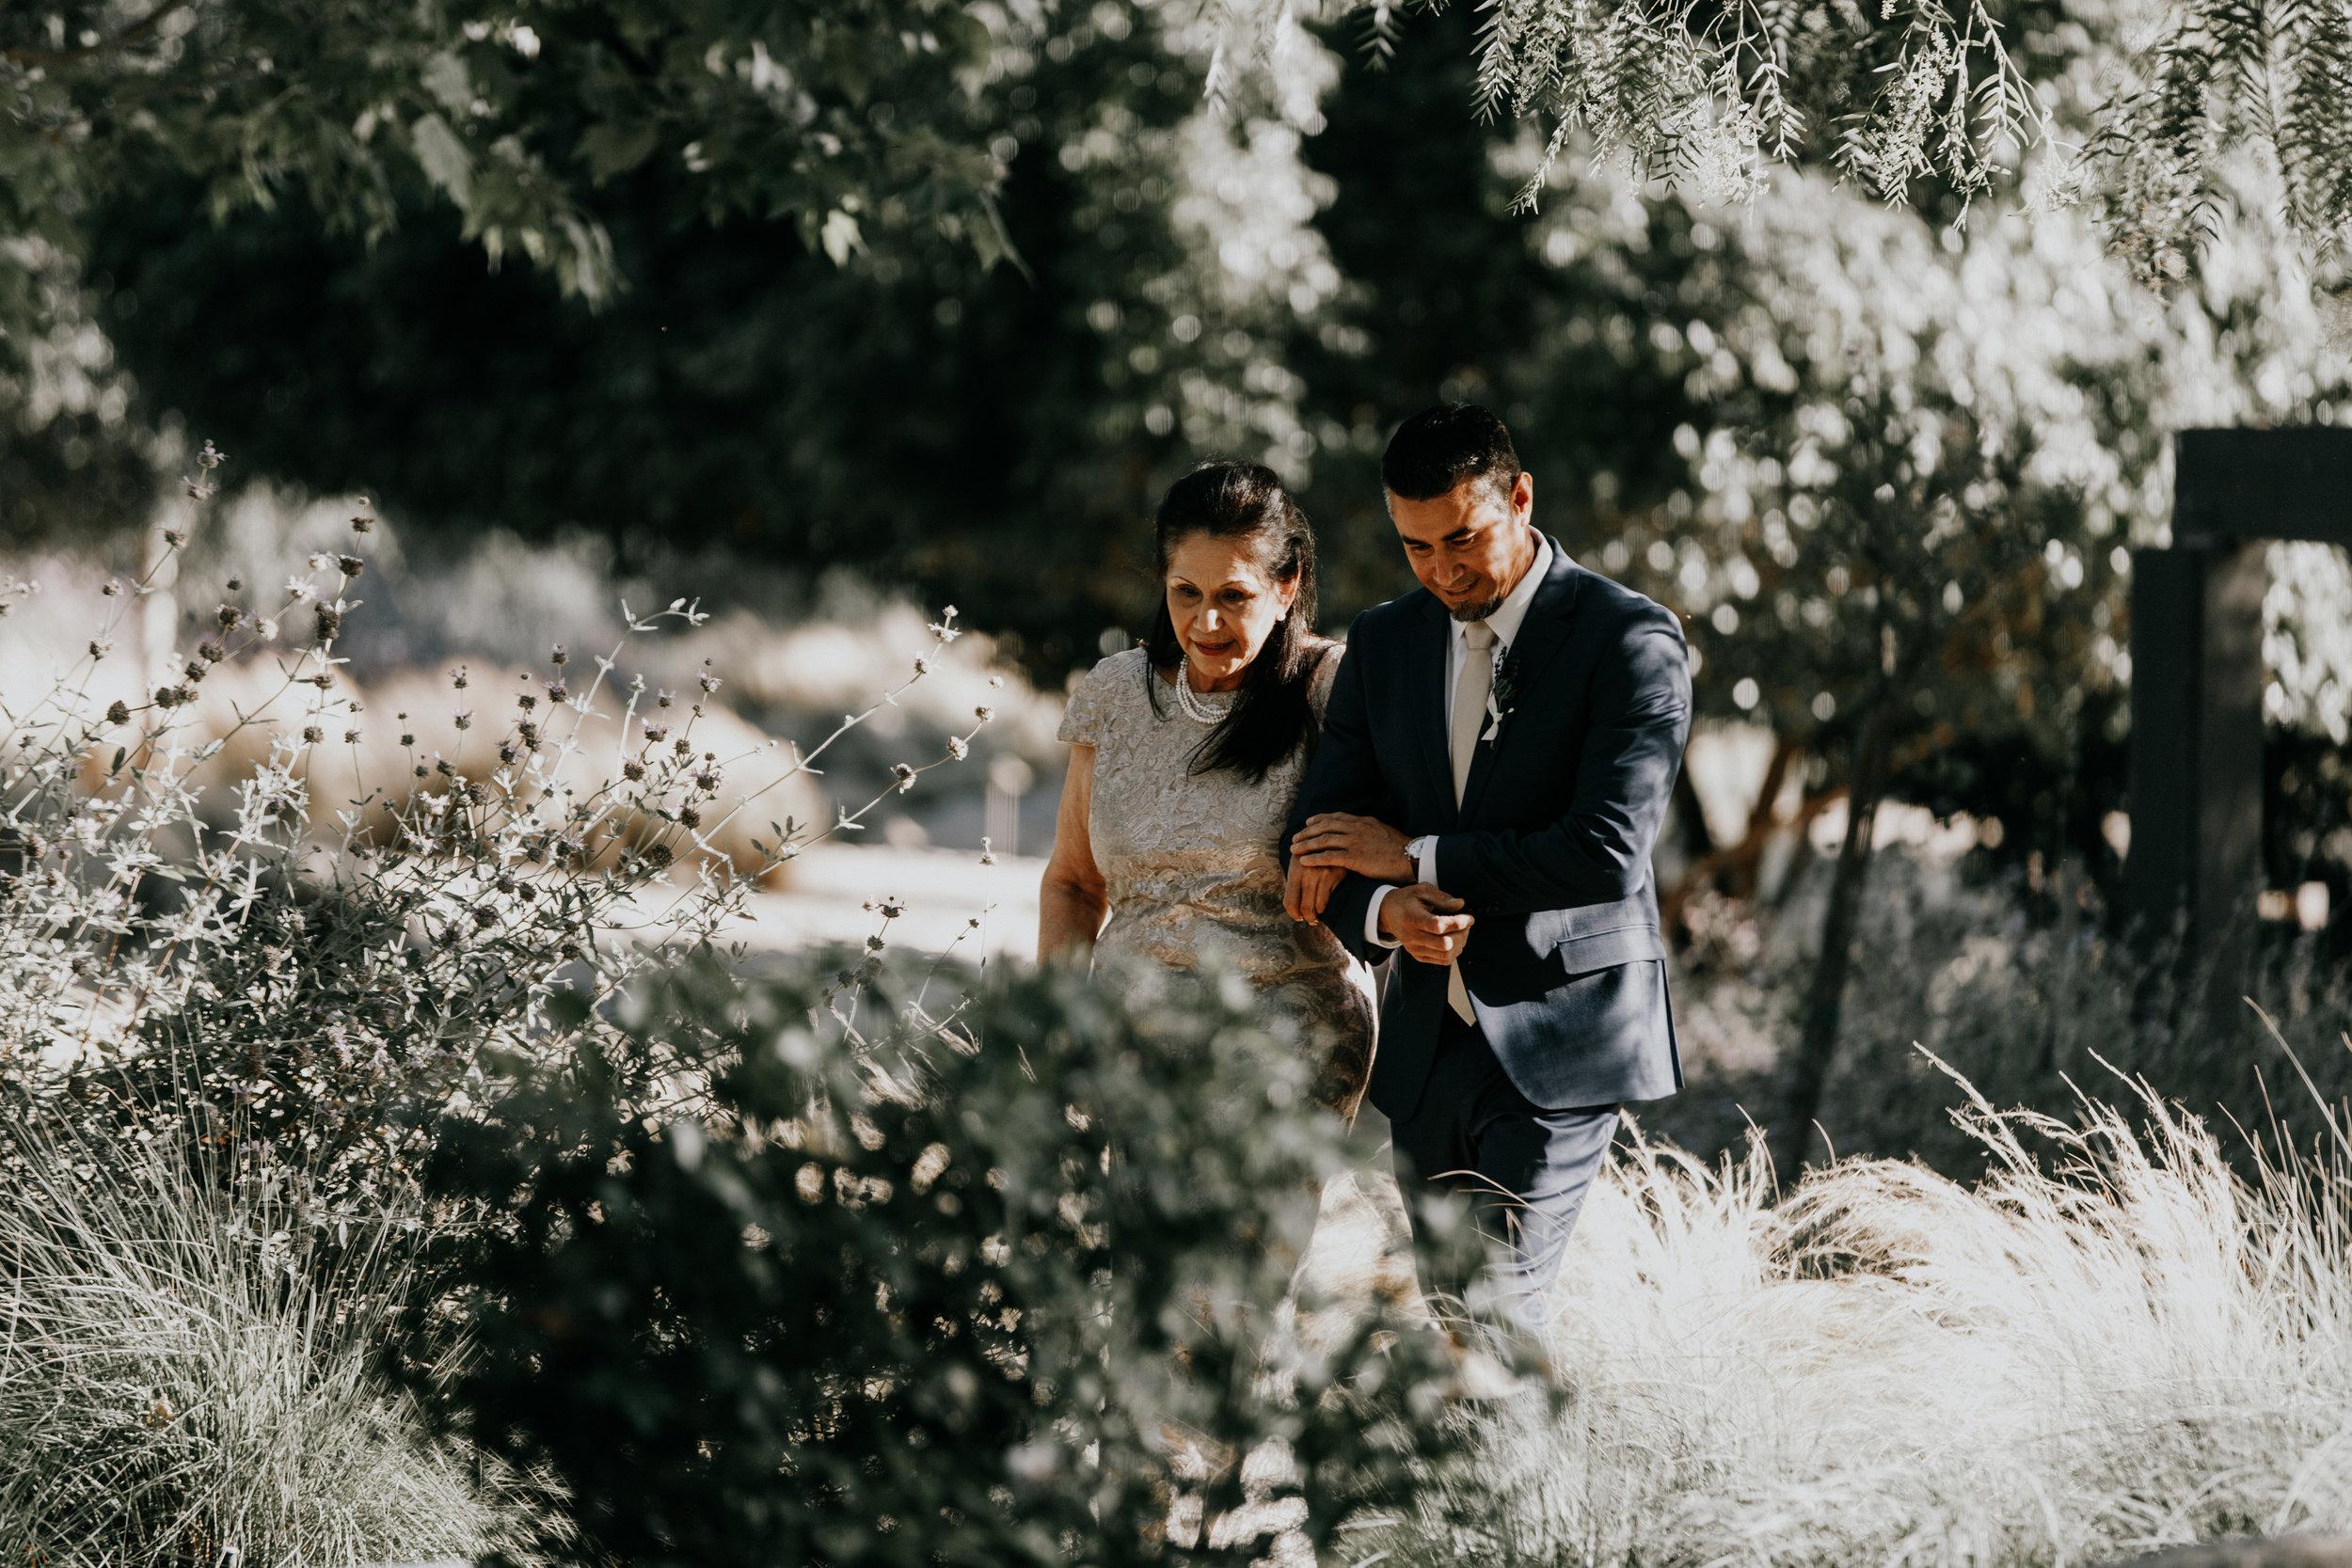 WeddingvenuesinTemecula.jpg